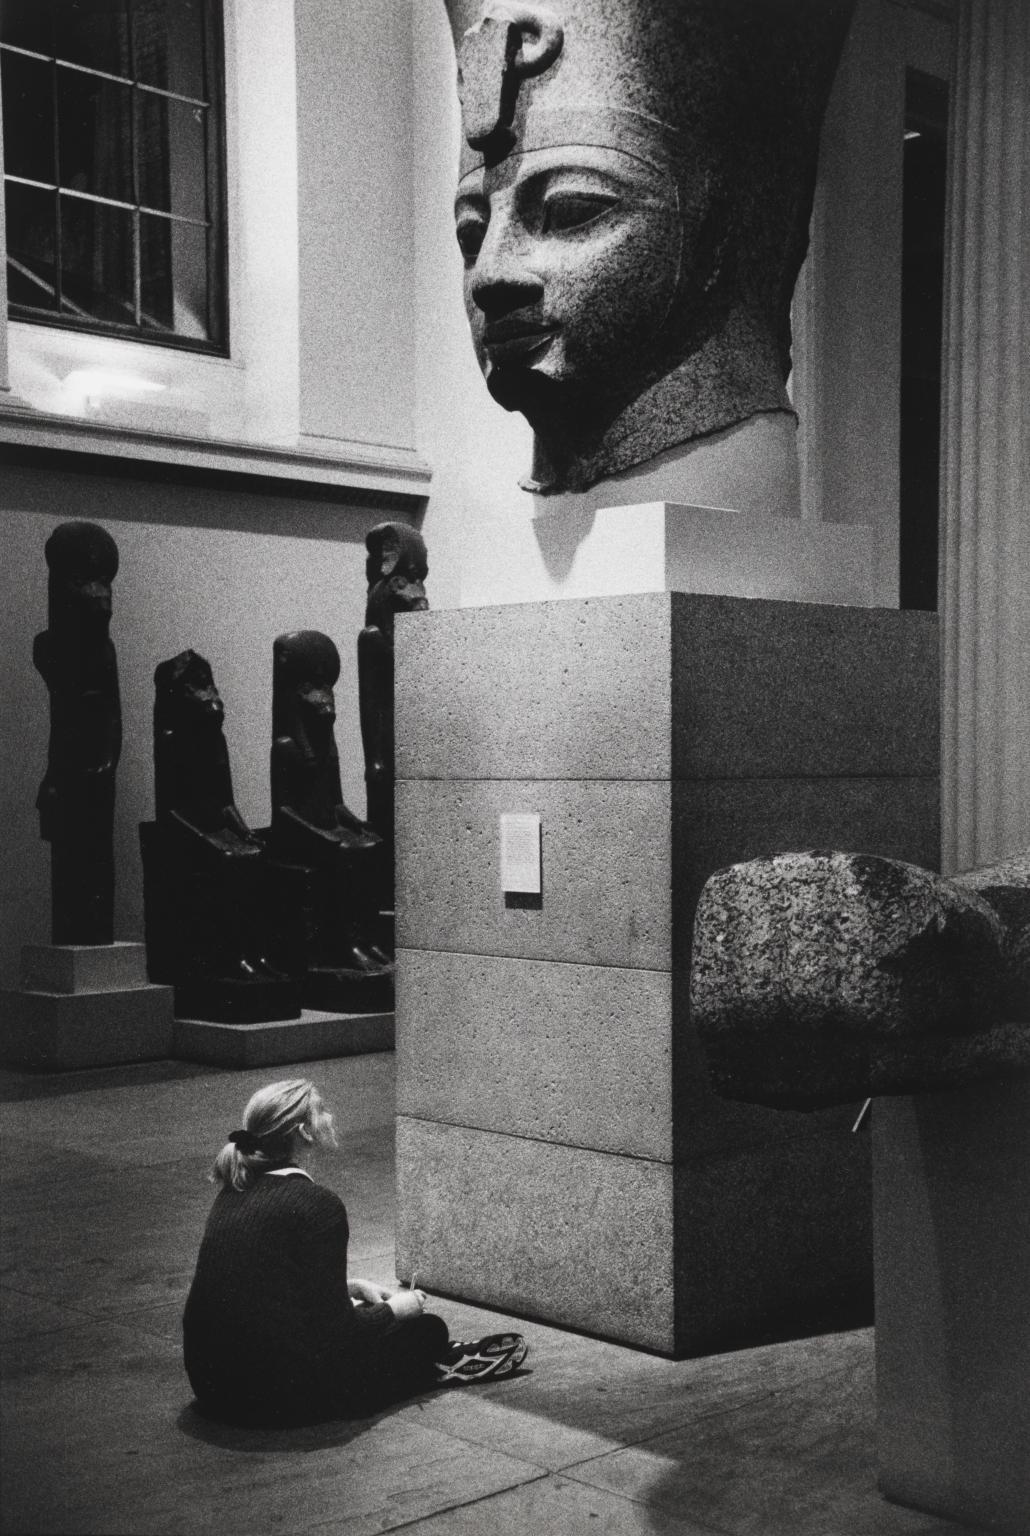 Британский музей, Лондон, 1995. Фотограф Эллиотт Эрвитт